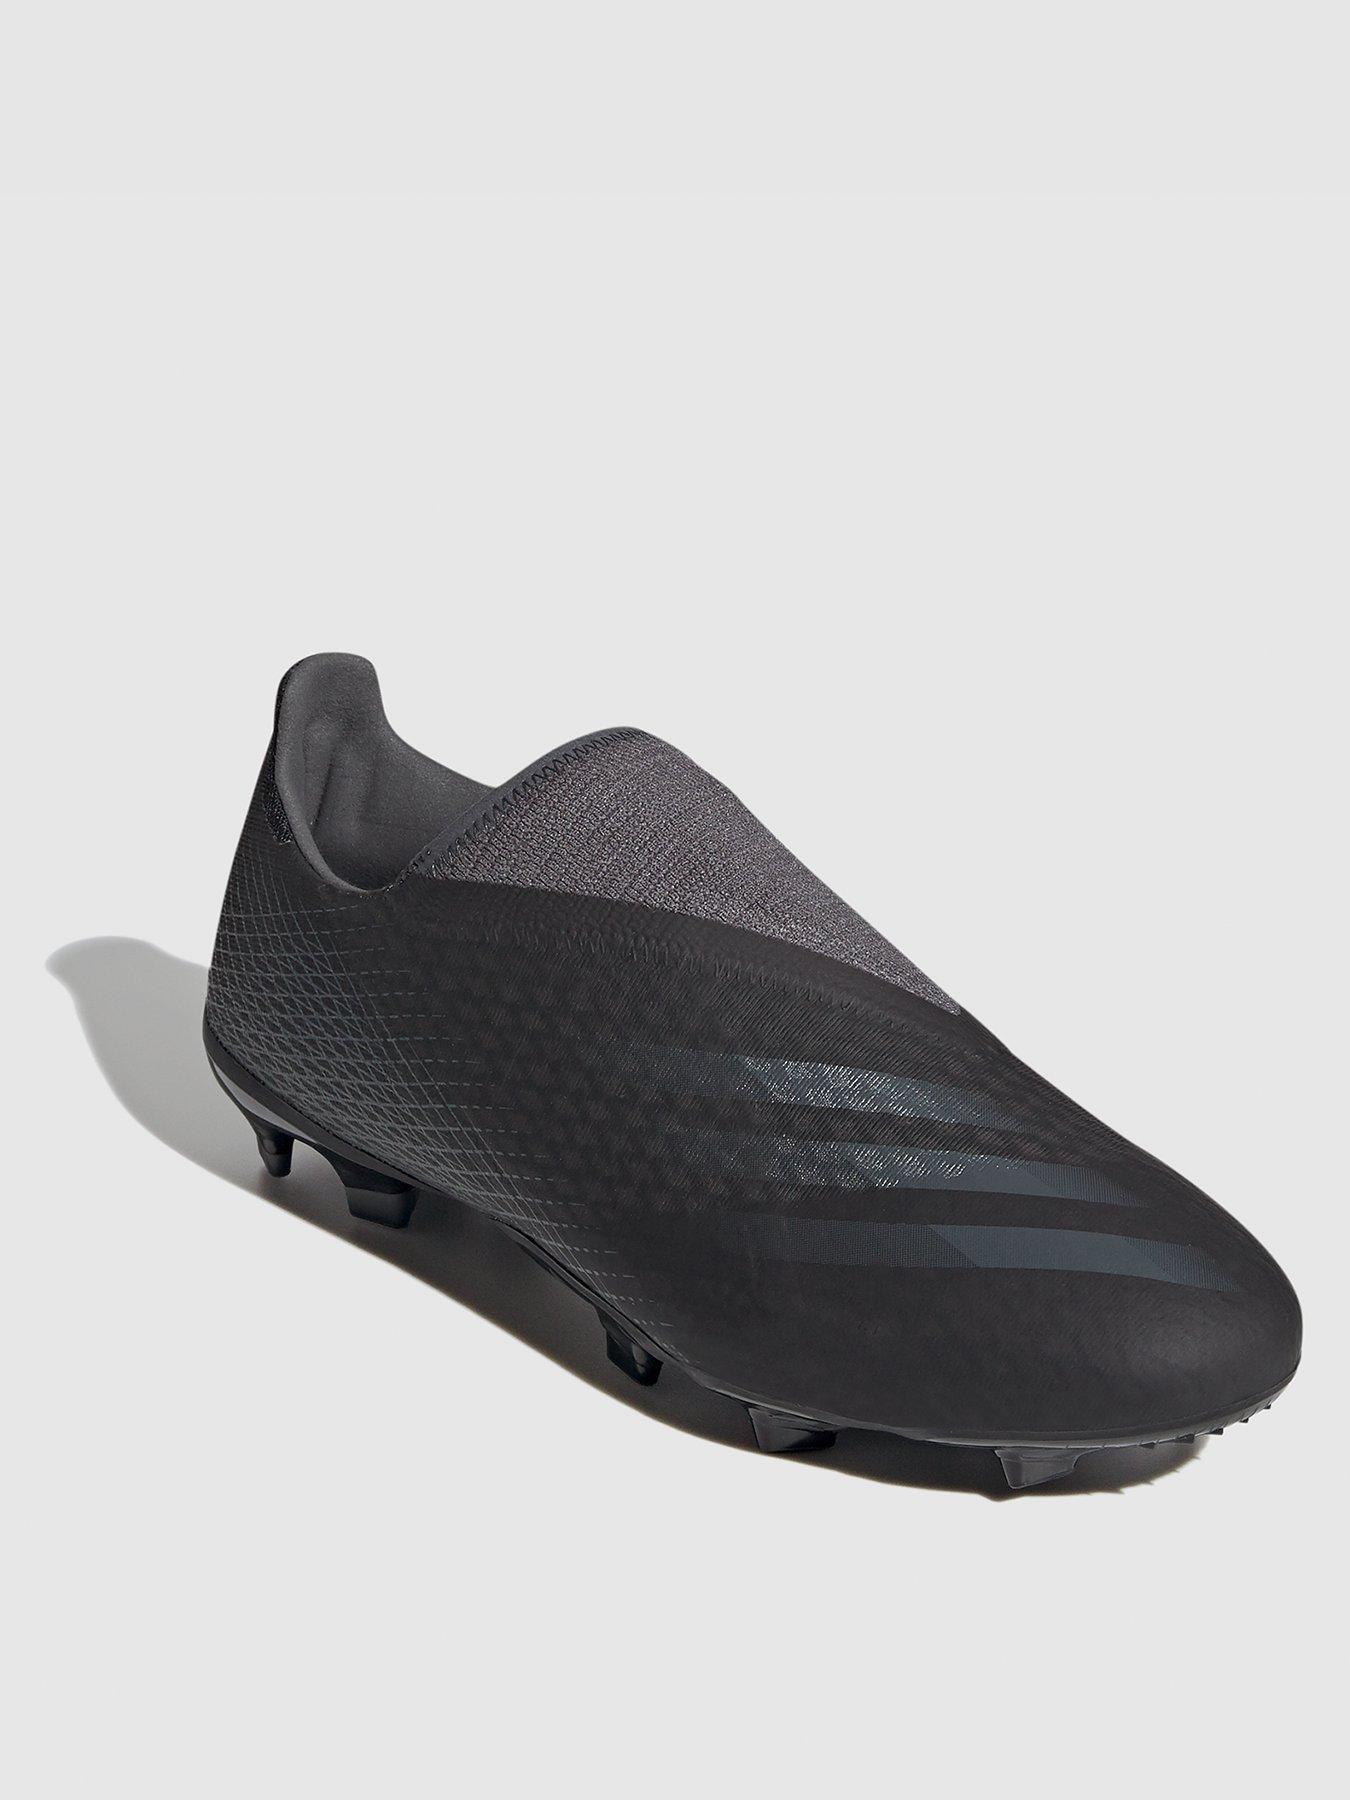 Adidas   Football boots   Mens sports